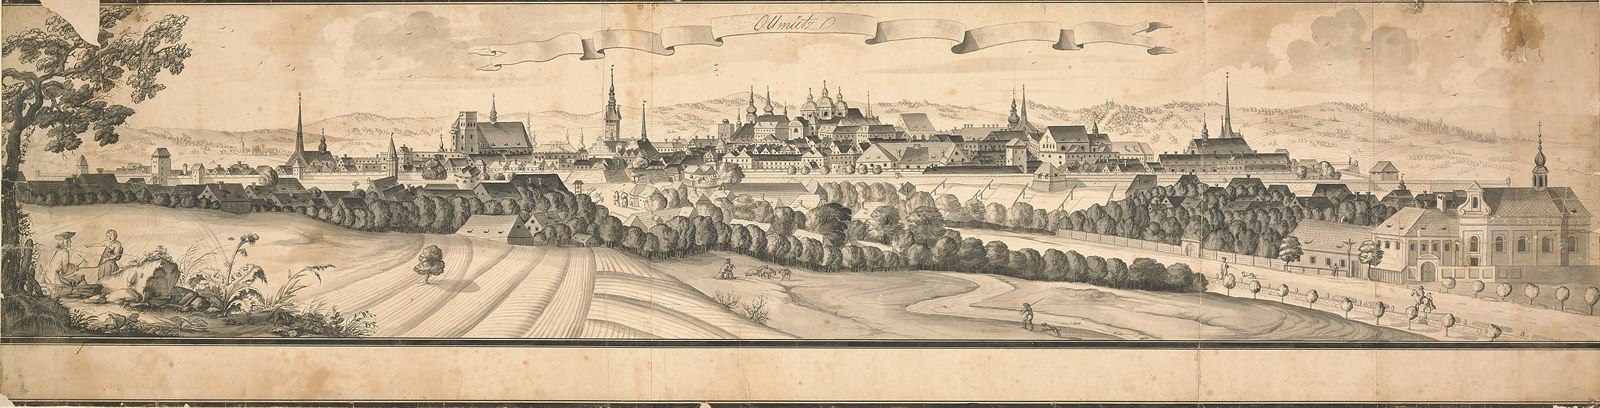 Olomouc 1731-1732 Anonym Veduta.jpg